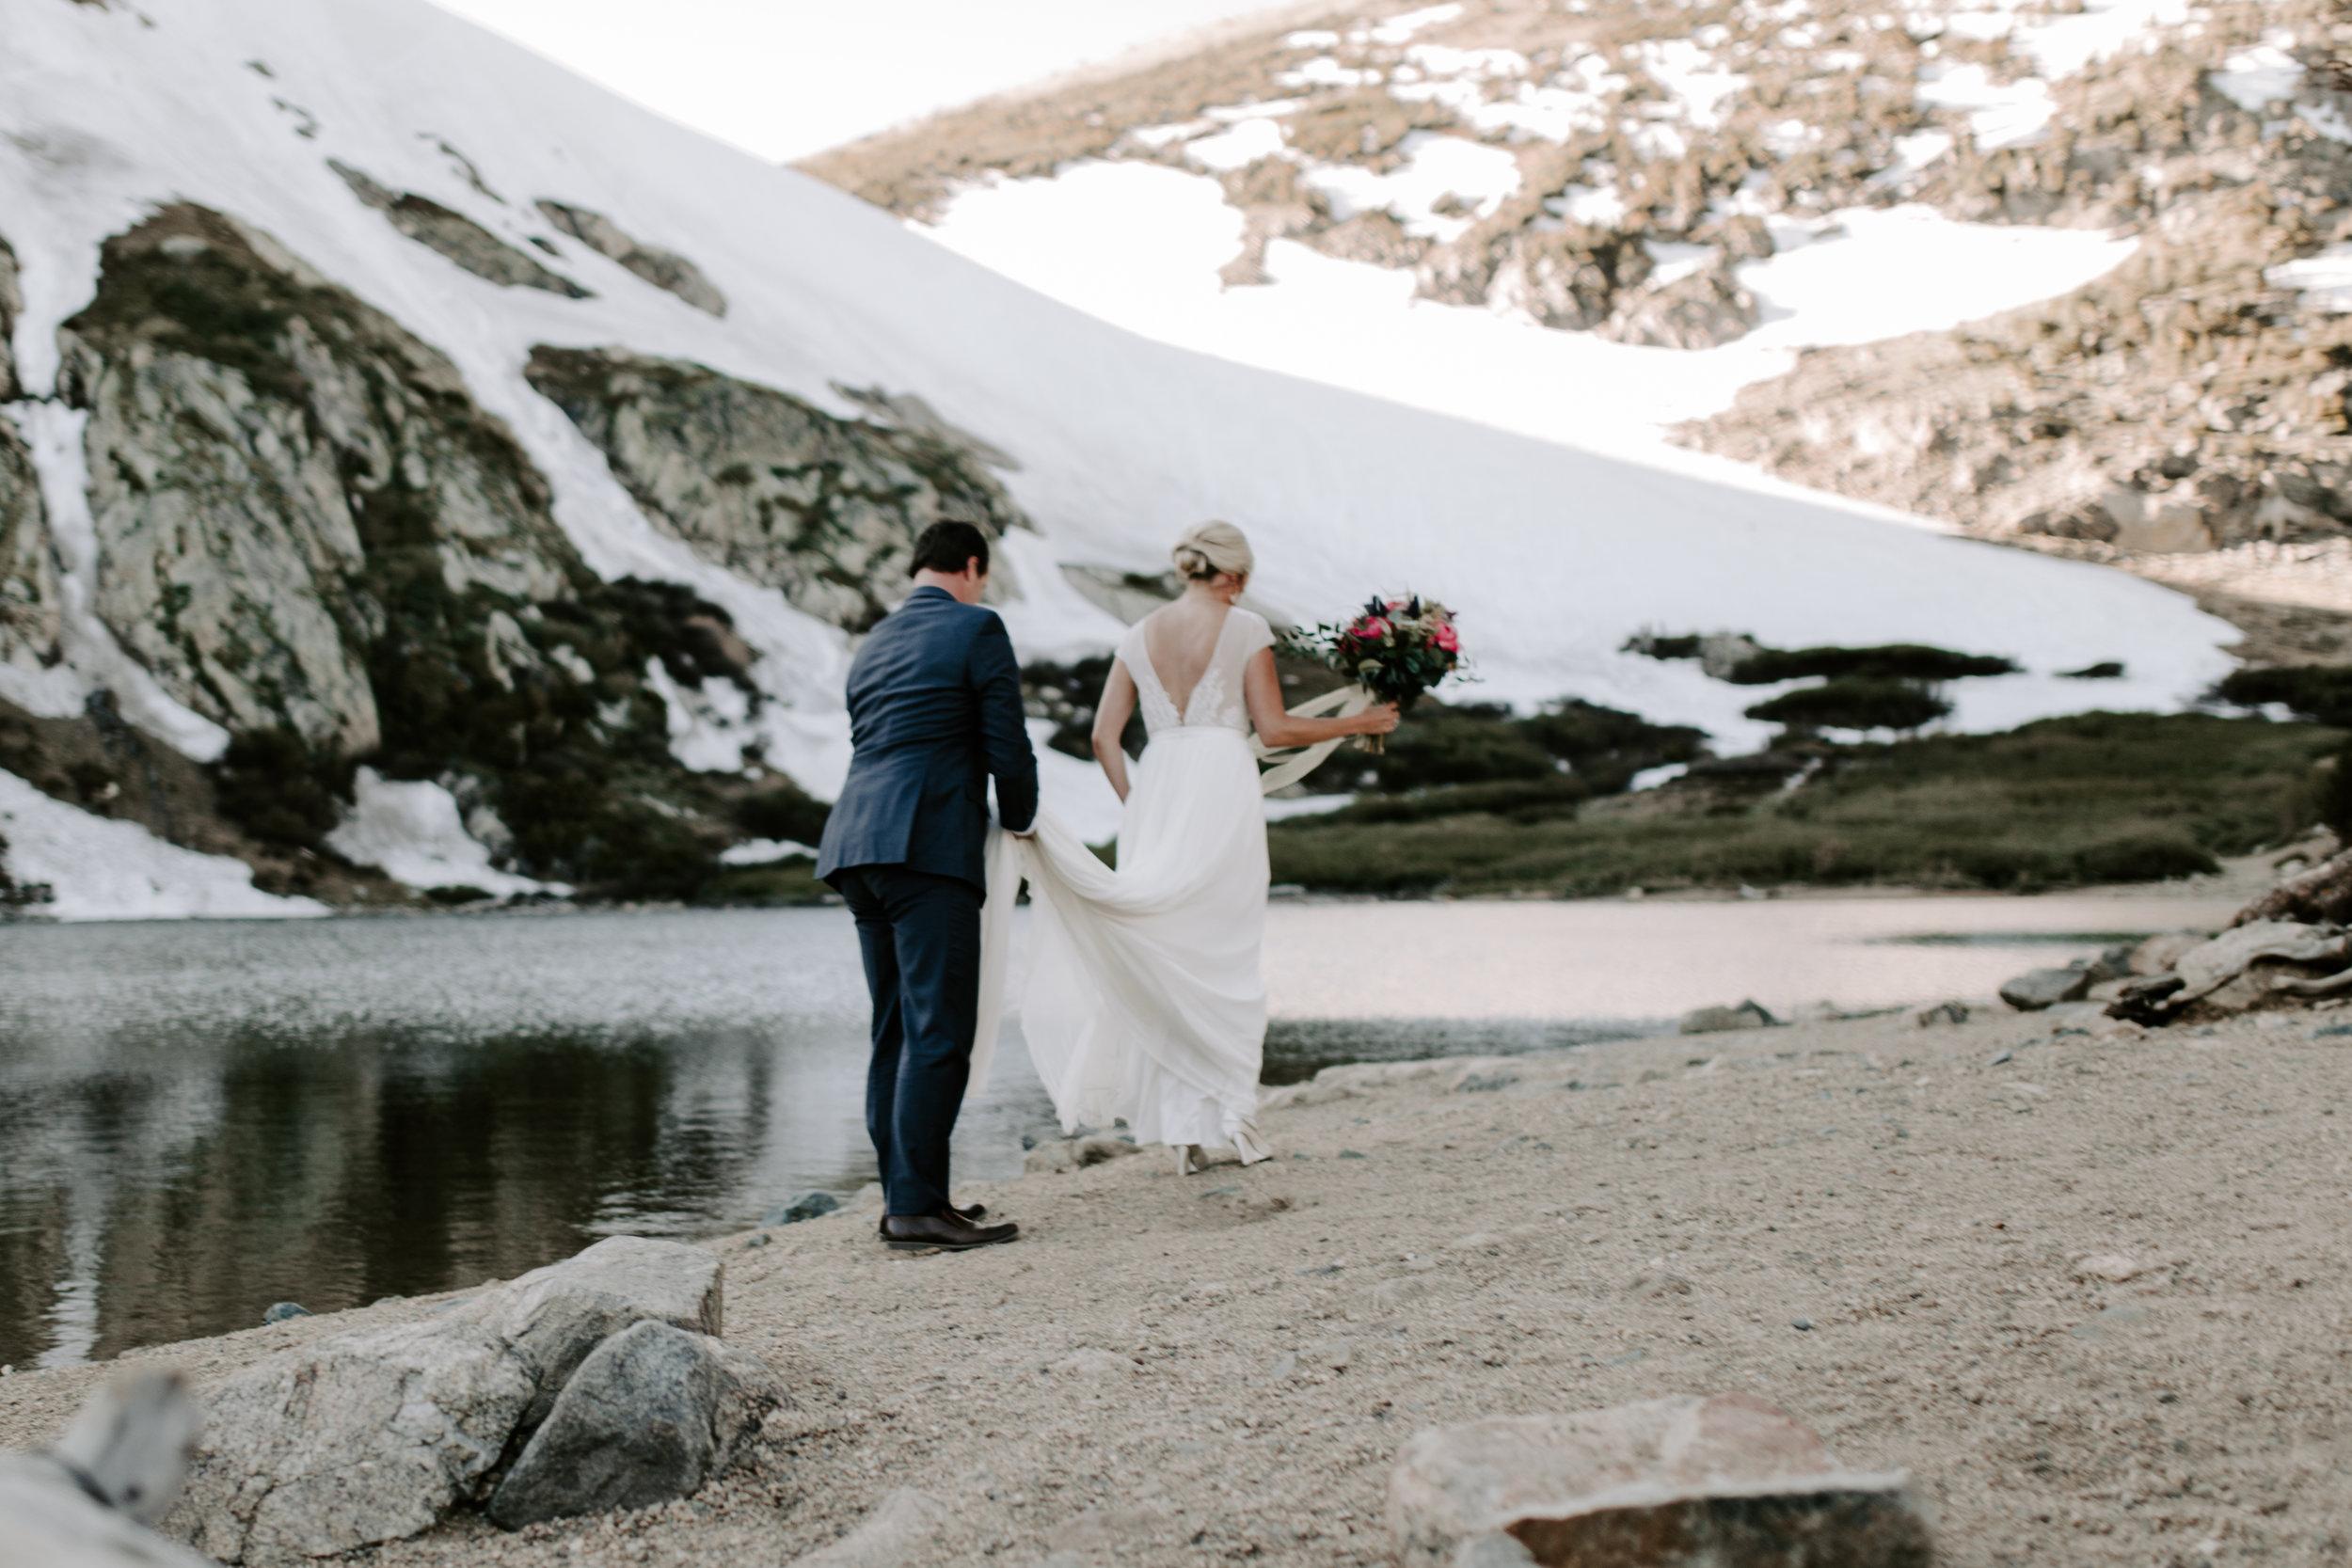 wedding elopement engagement anniversary travel colorado photographer photography-19.jpg